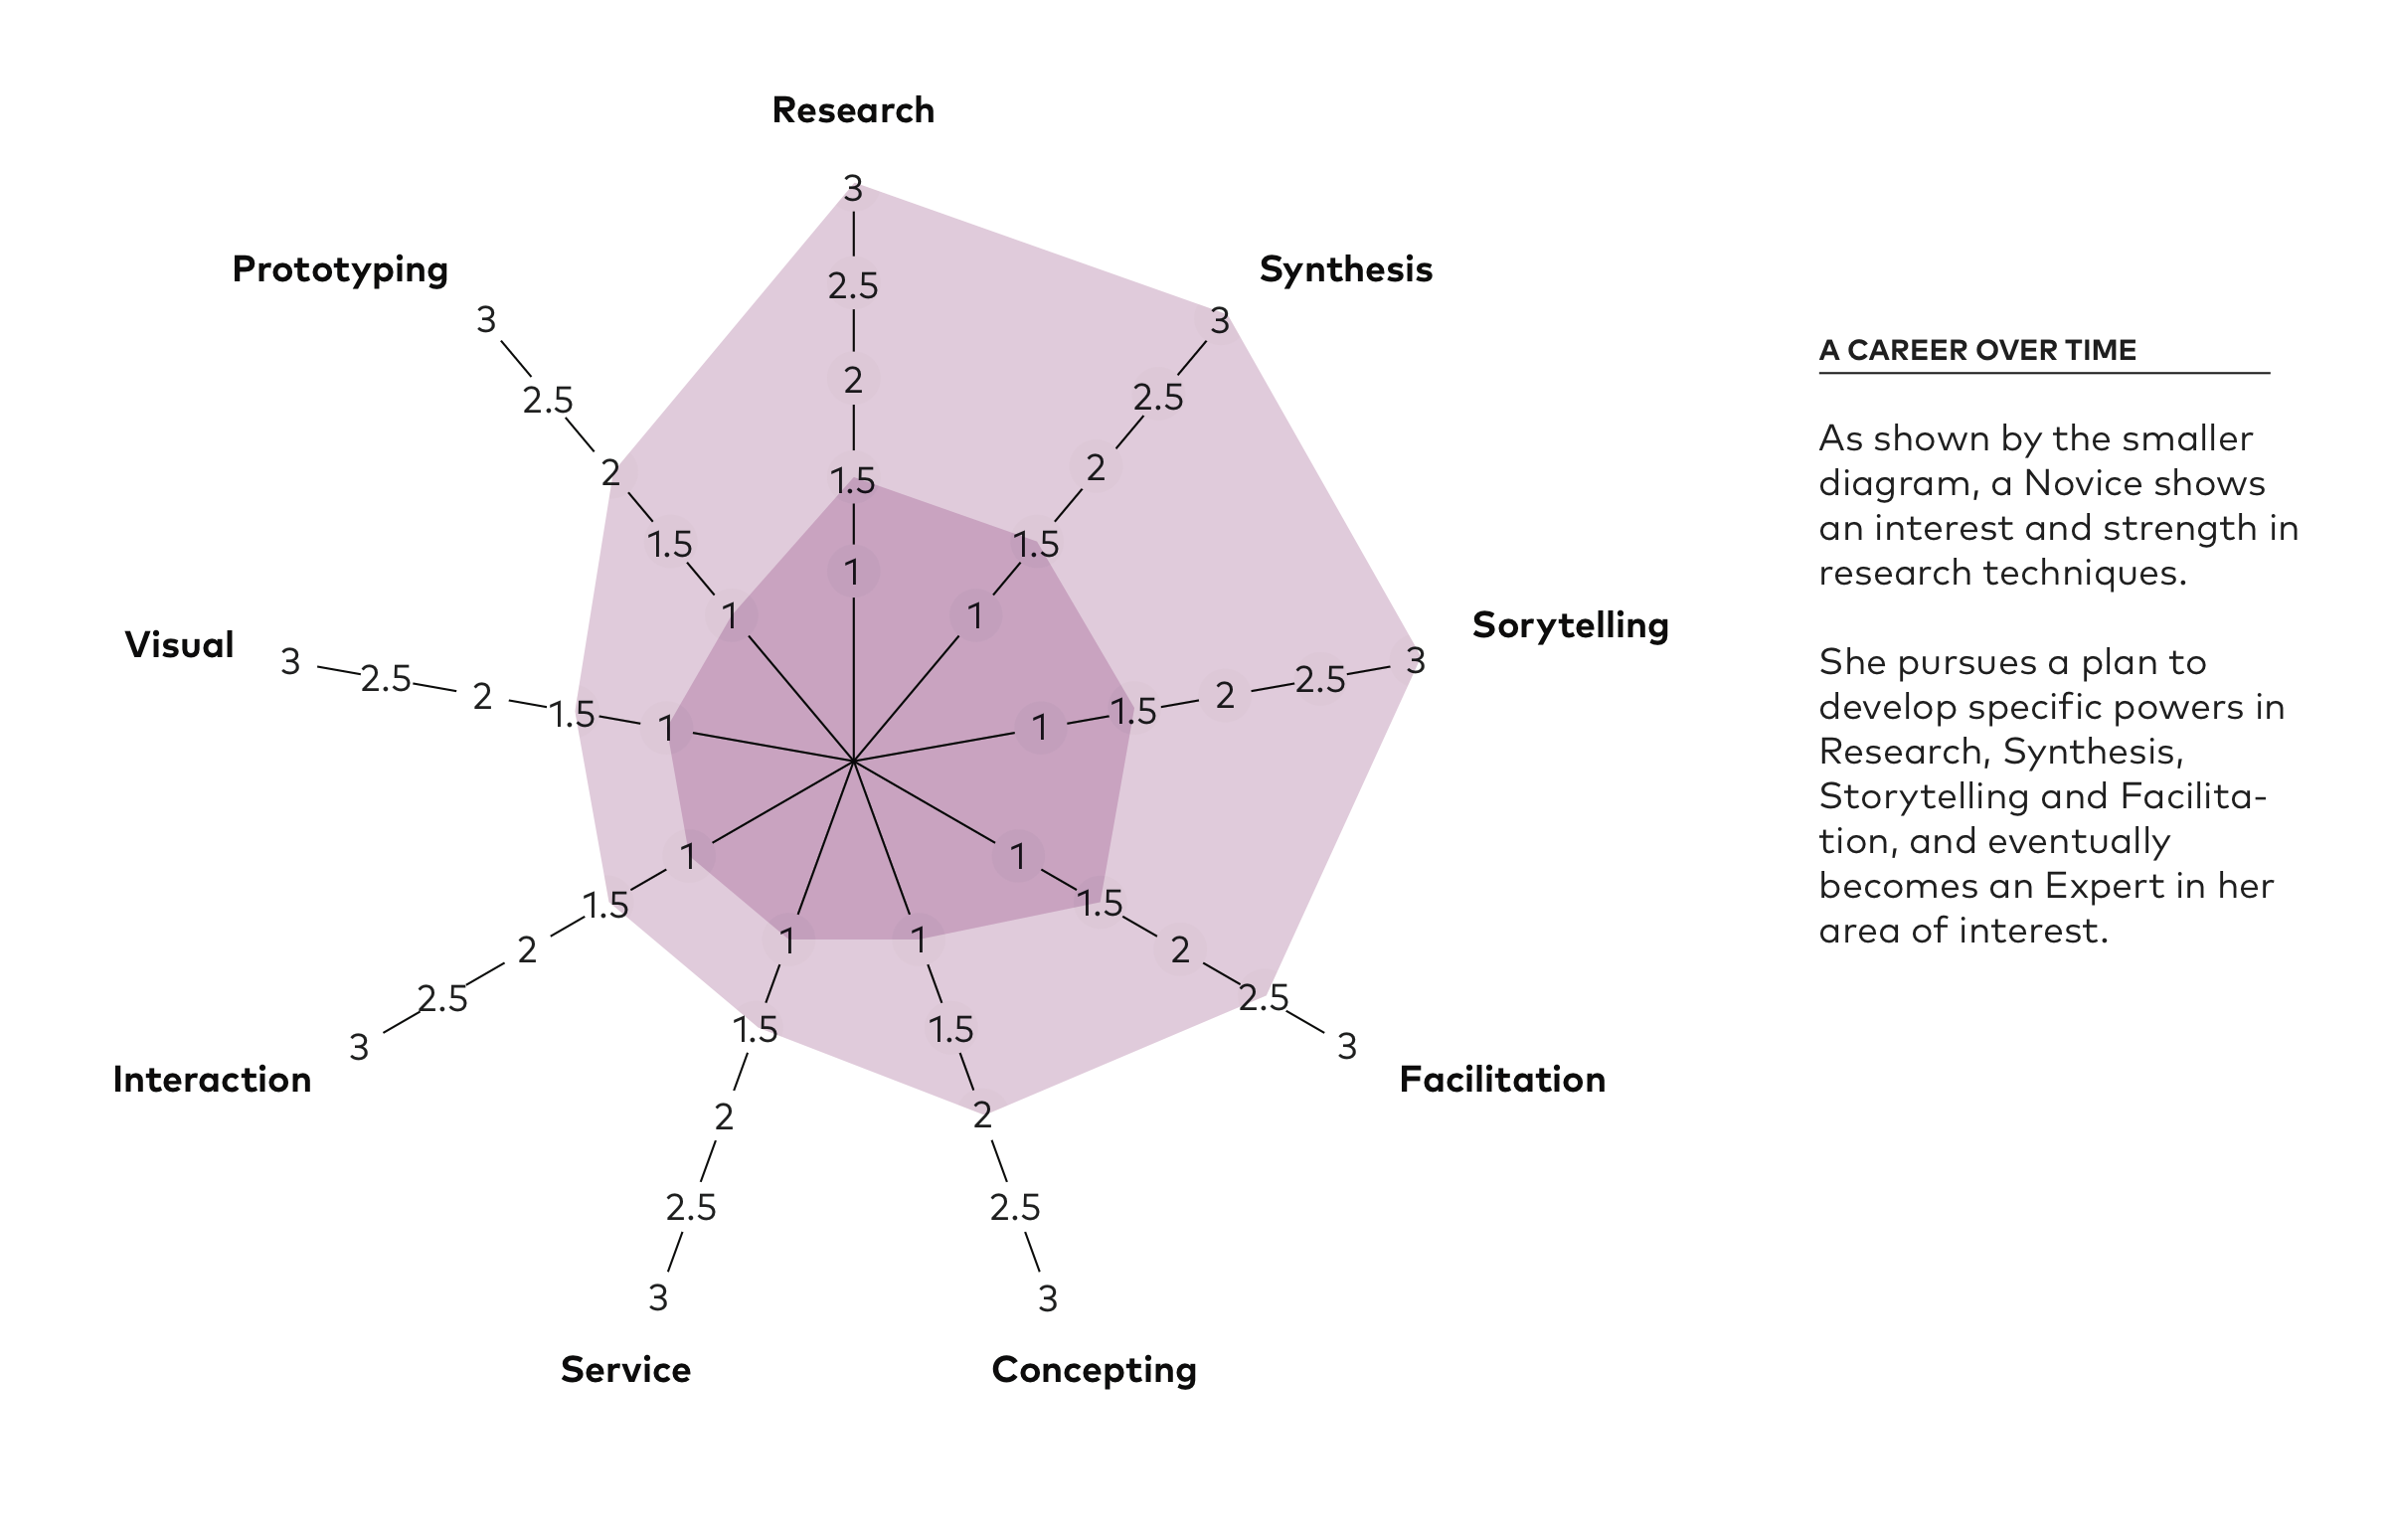 YouX Star visualizes mastery in skills, helping designers set development goals